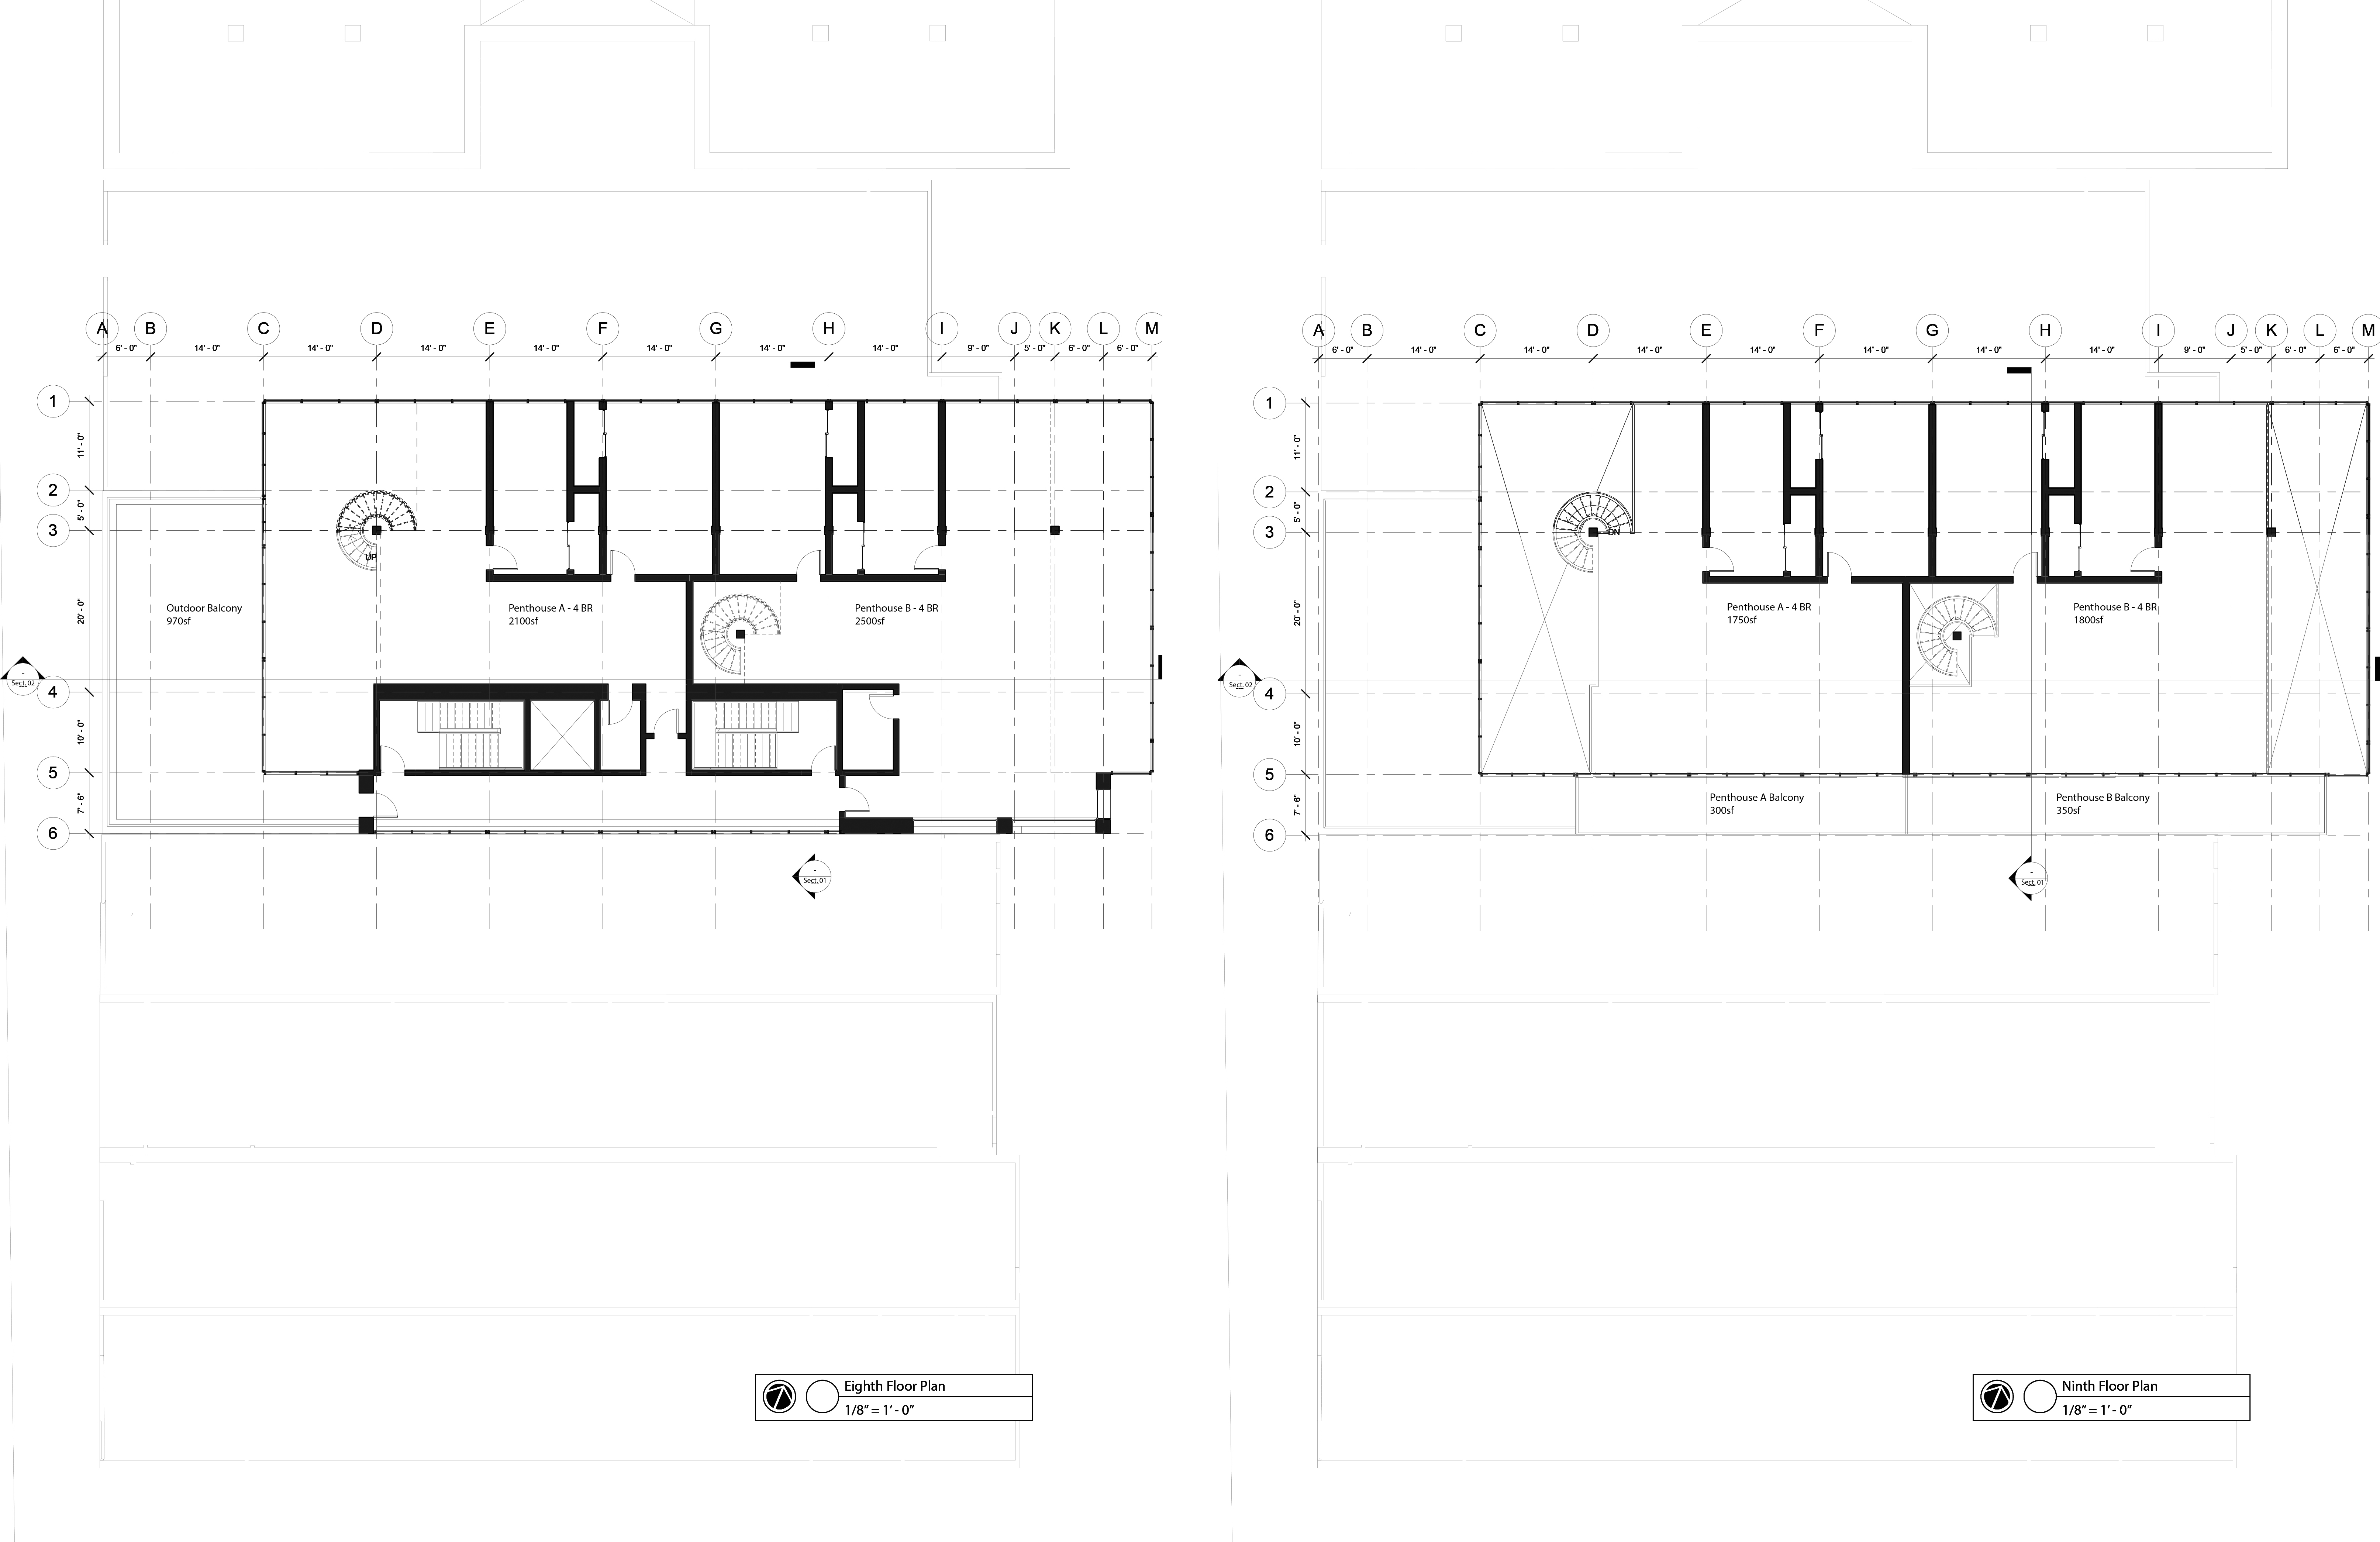 8th floor - 9th floor plans